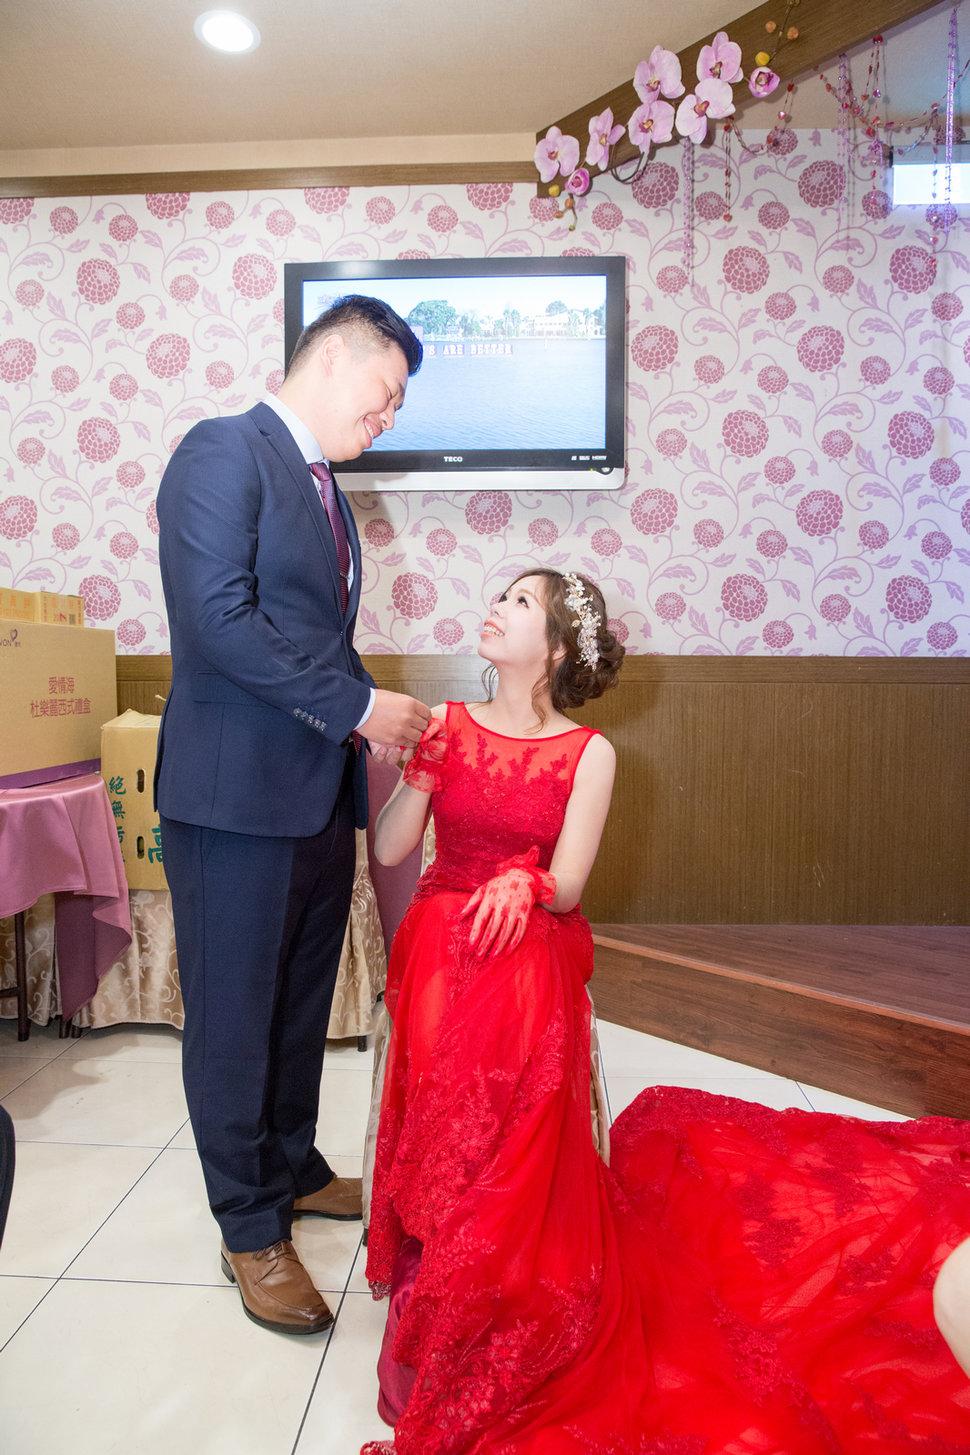 HANK9551 - 蛋拔婚禮紀錄 - 結婚吧